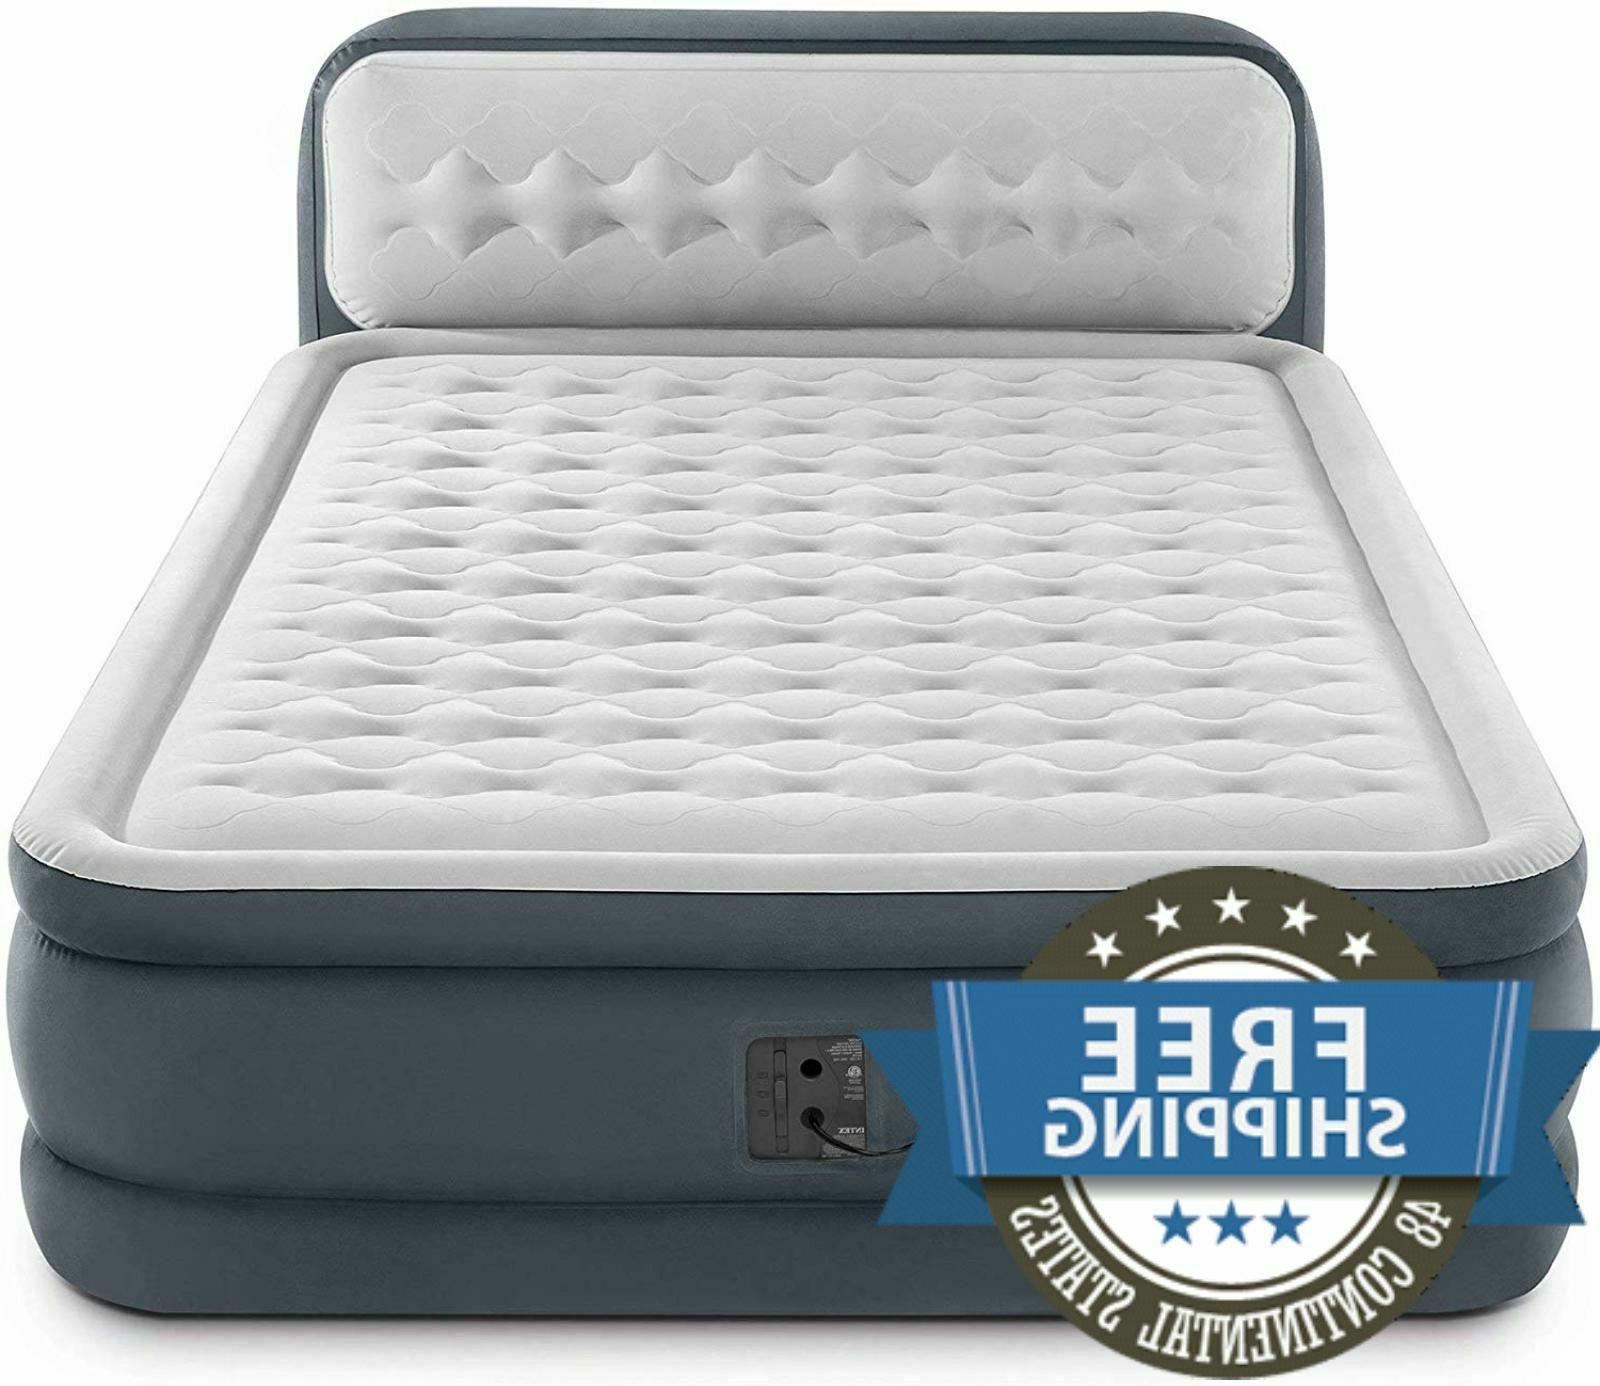 Air Bed With Built In Pump Queen Size Mattress Headboard Dur